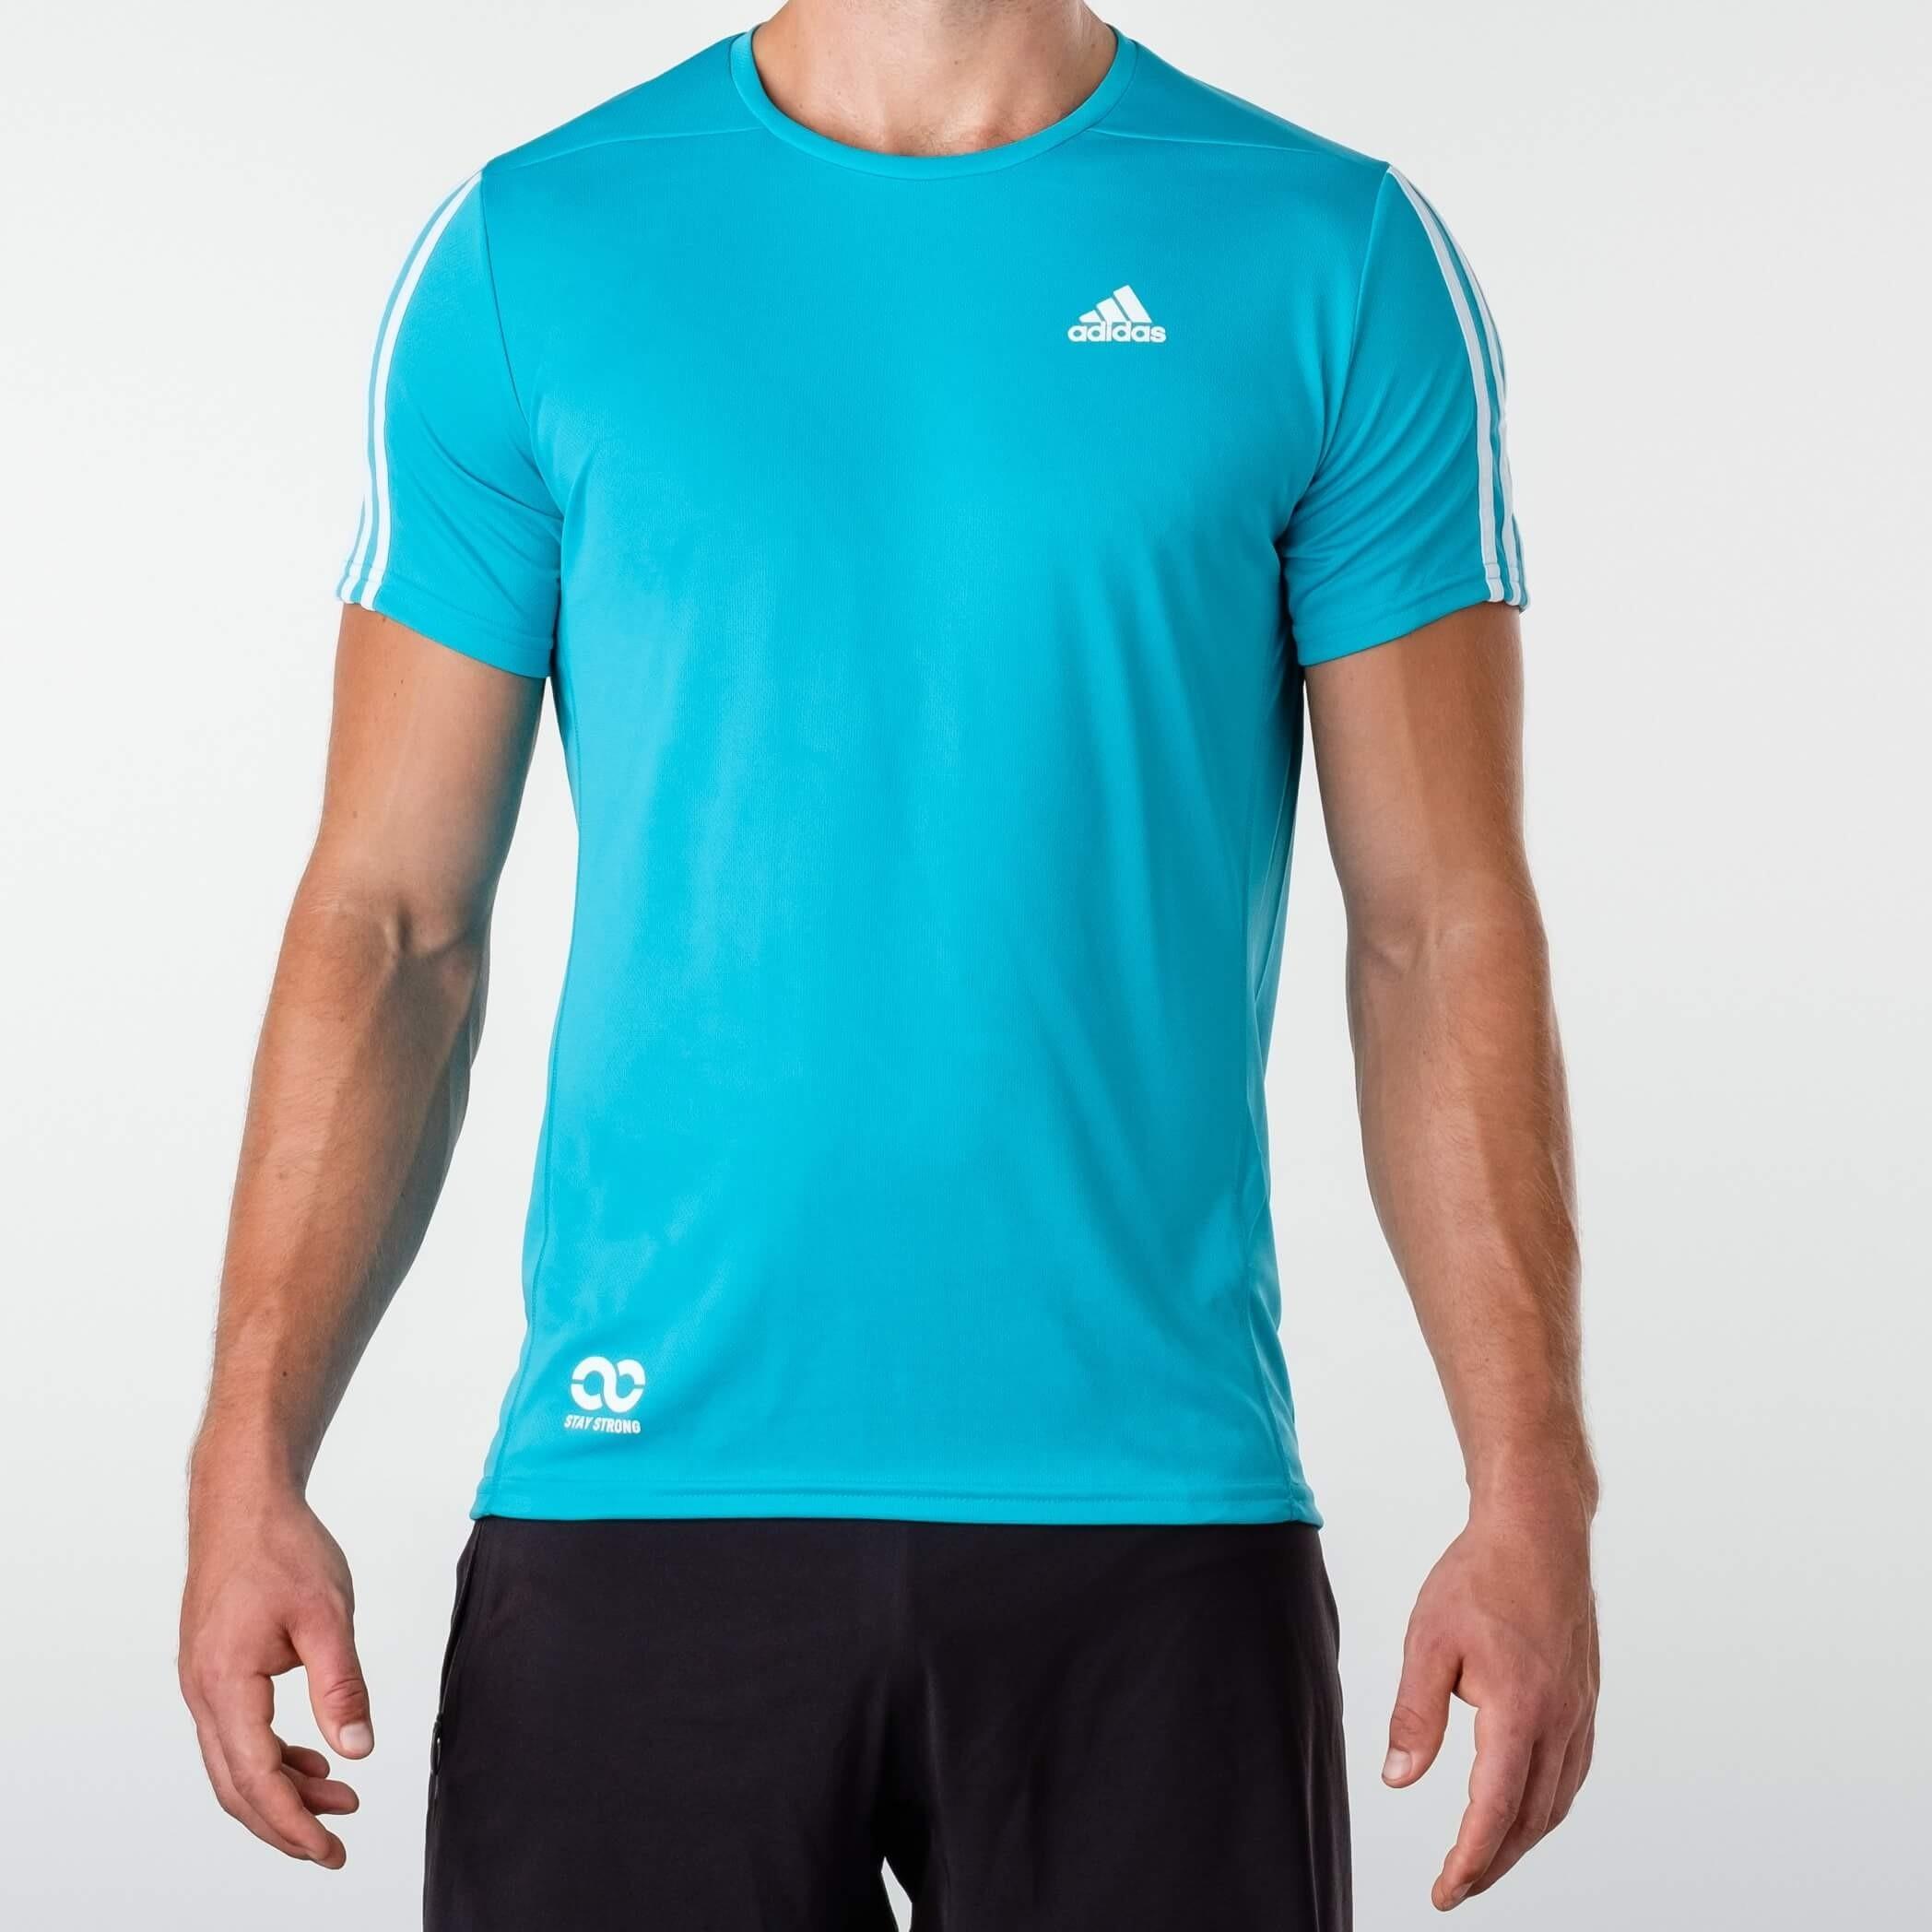 Adidas Original Bootcamp Shirt (Männer)